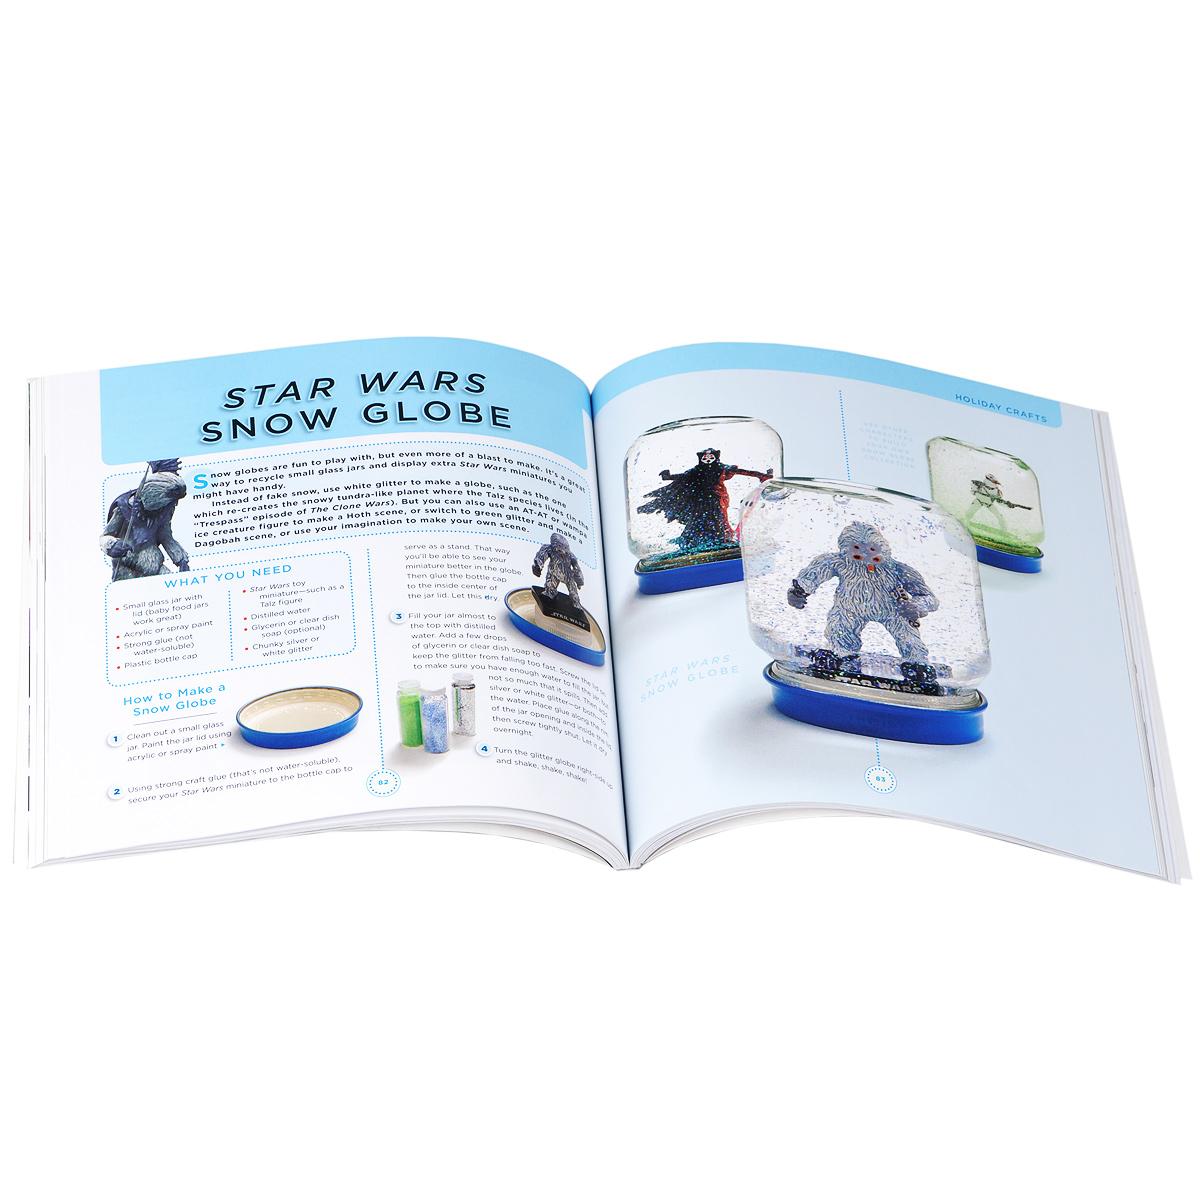 The Star Wars: Craft Book